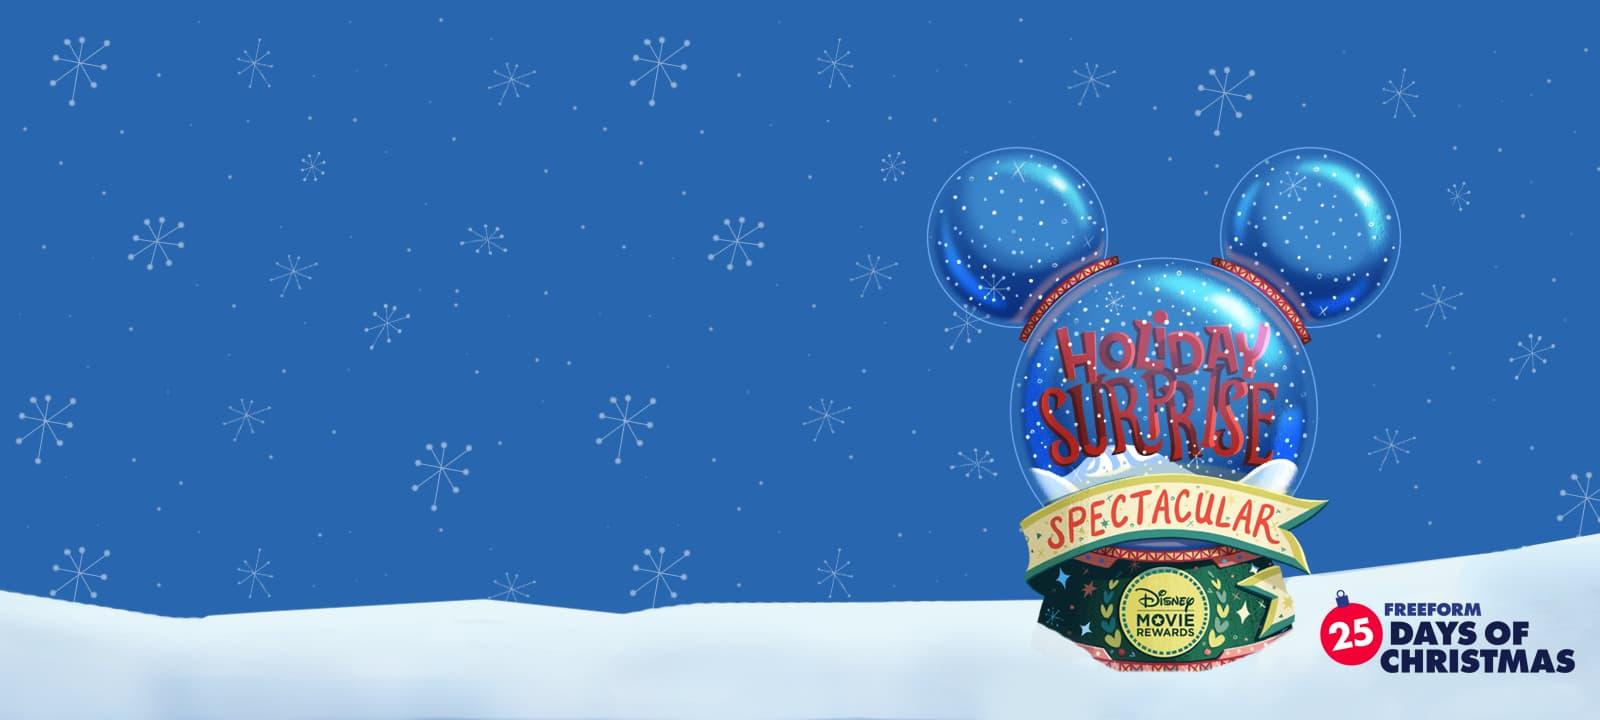 Freeform 25 Days of Christmas   Santa's Sweepstakes